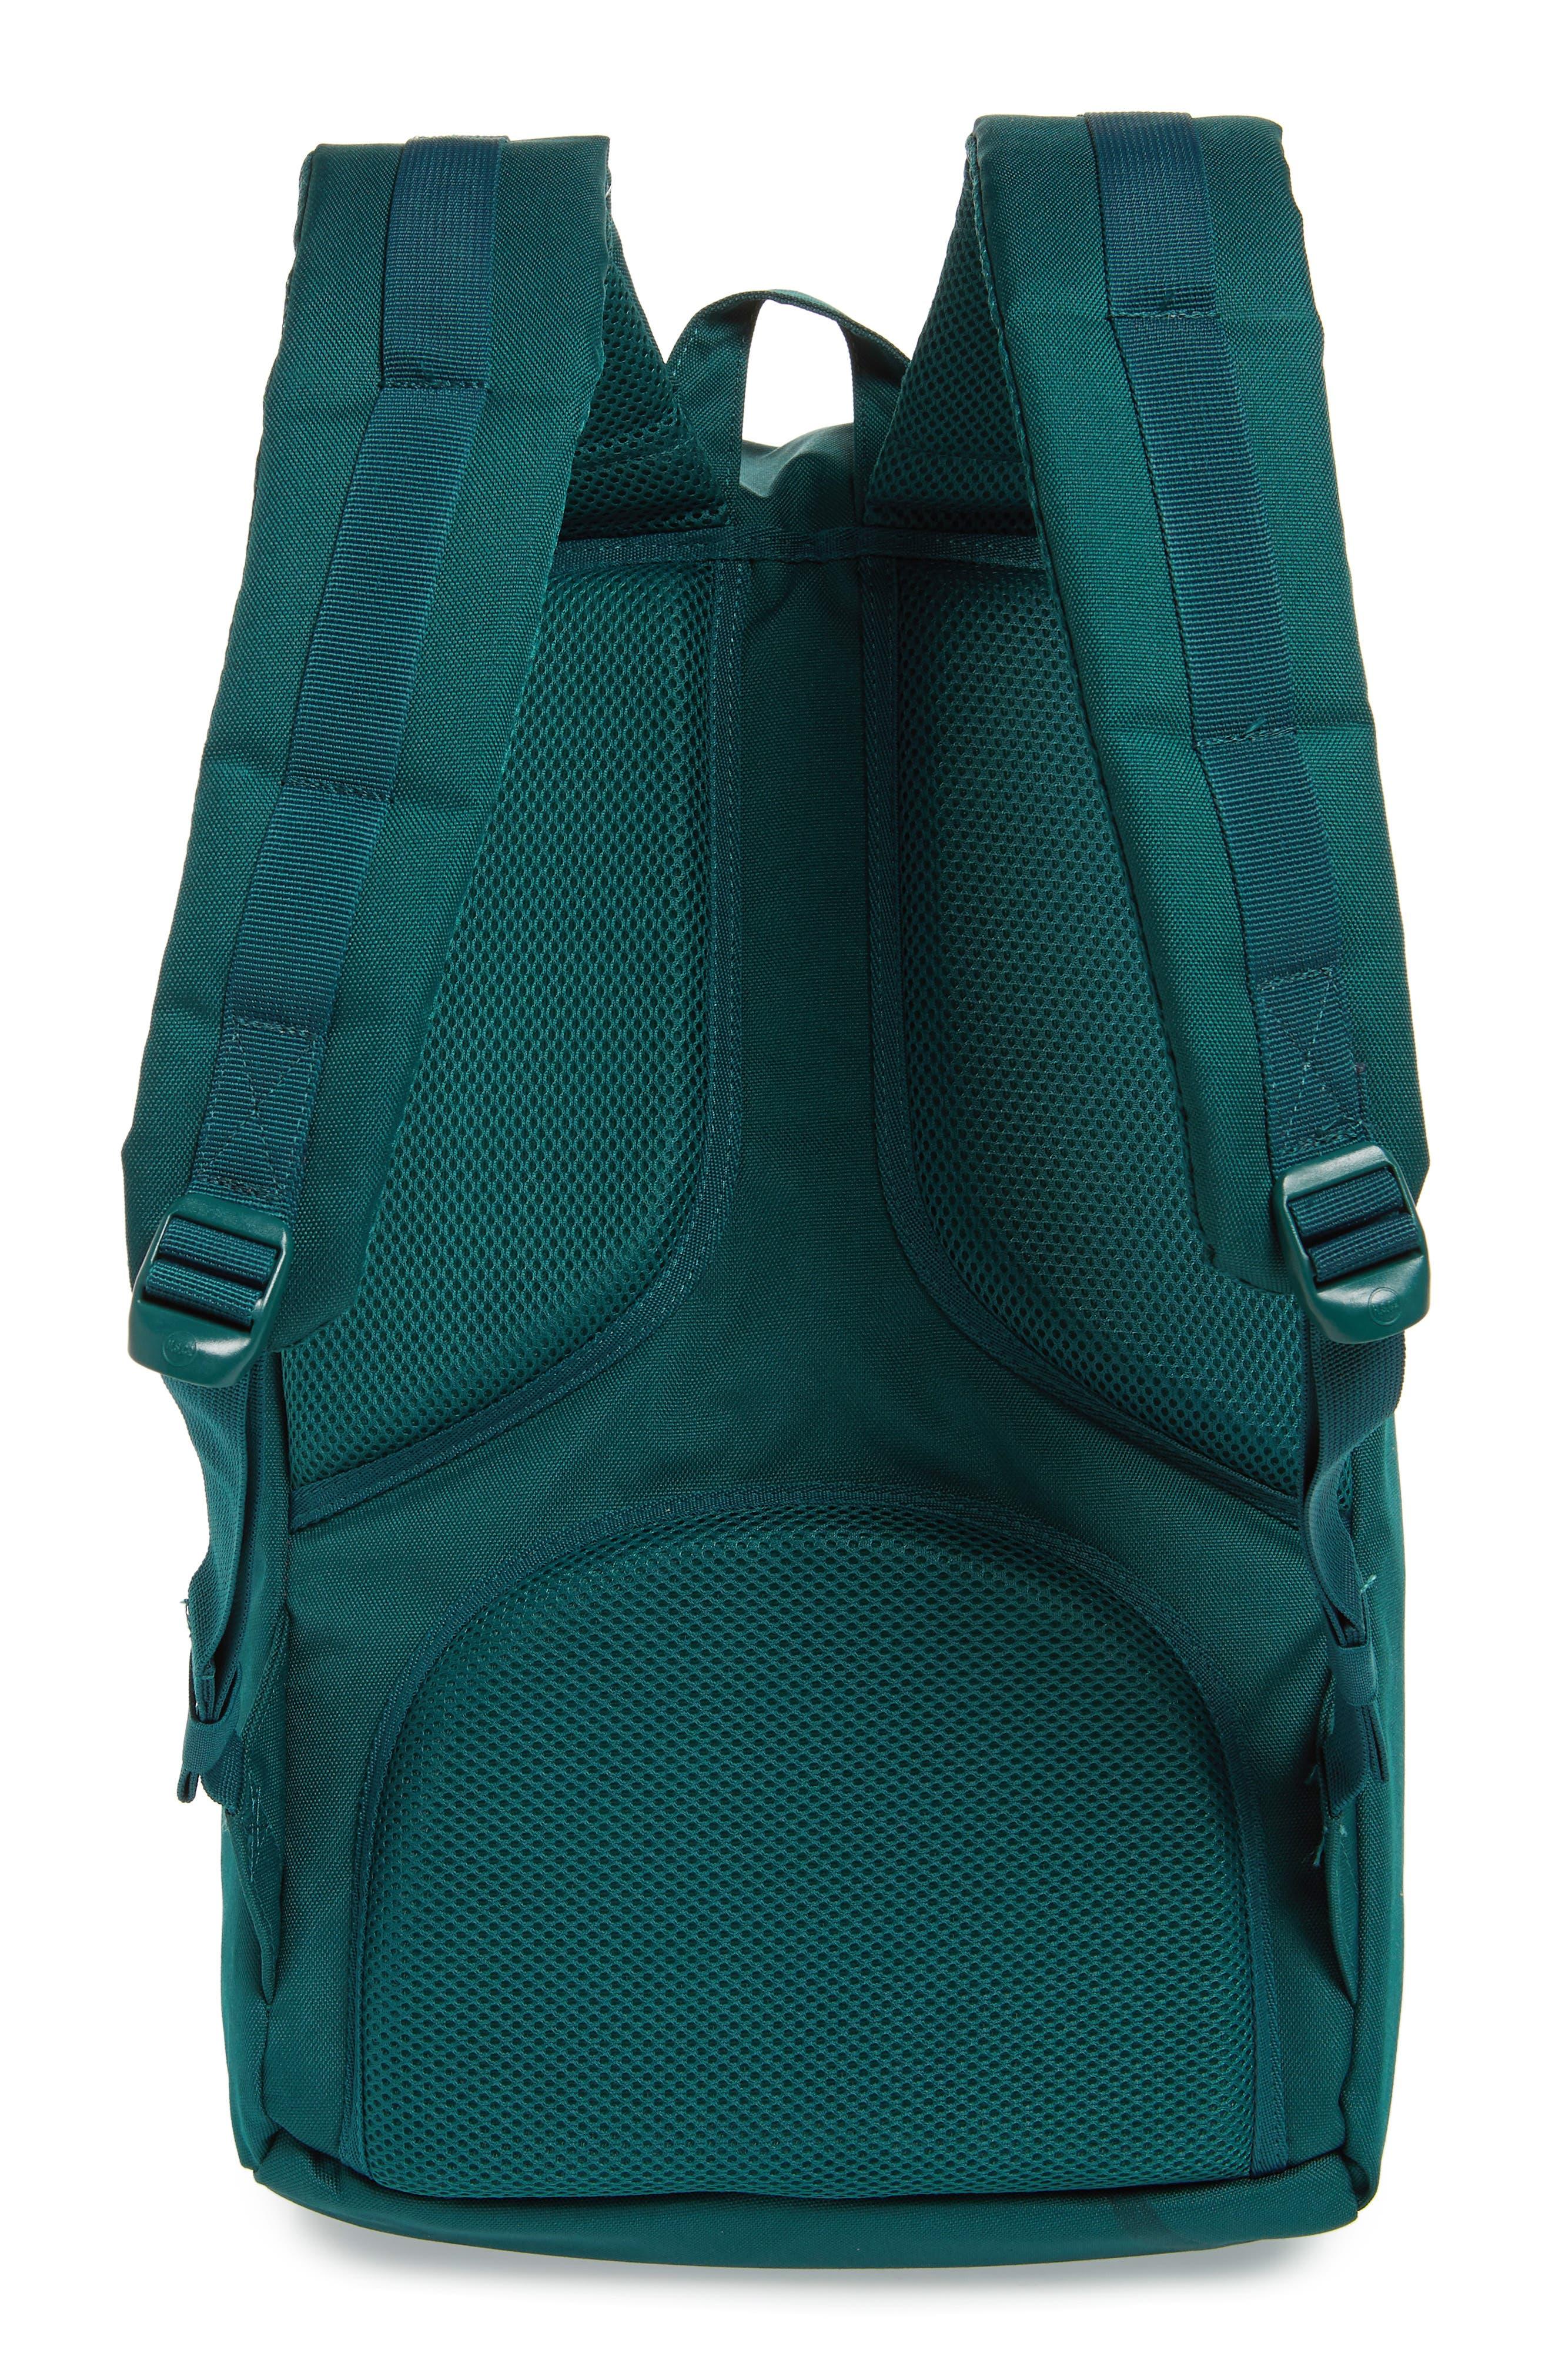 Little America Backpack,                             Alternate thumbnail 3, color,                             DEEP TEAL/ TAN